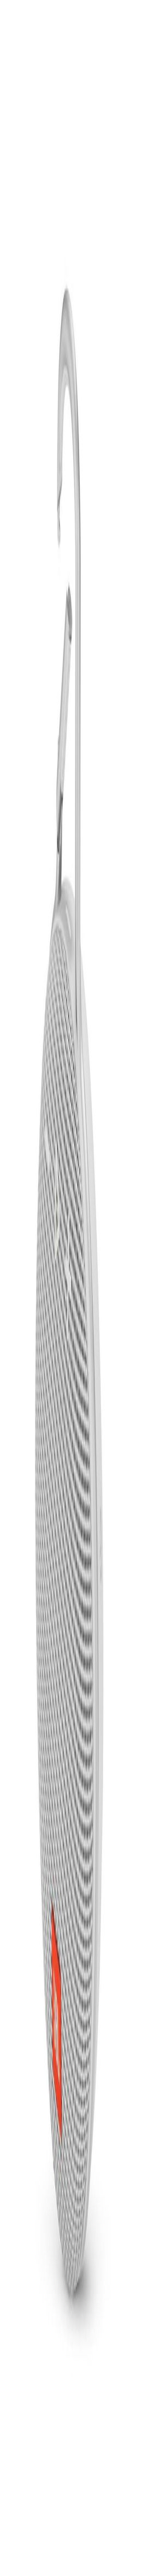 Портативная колонка JBL CLIP 3, белая фото